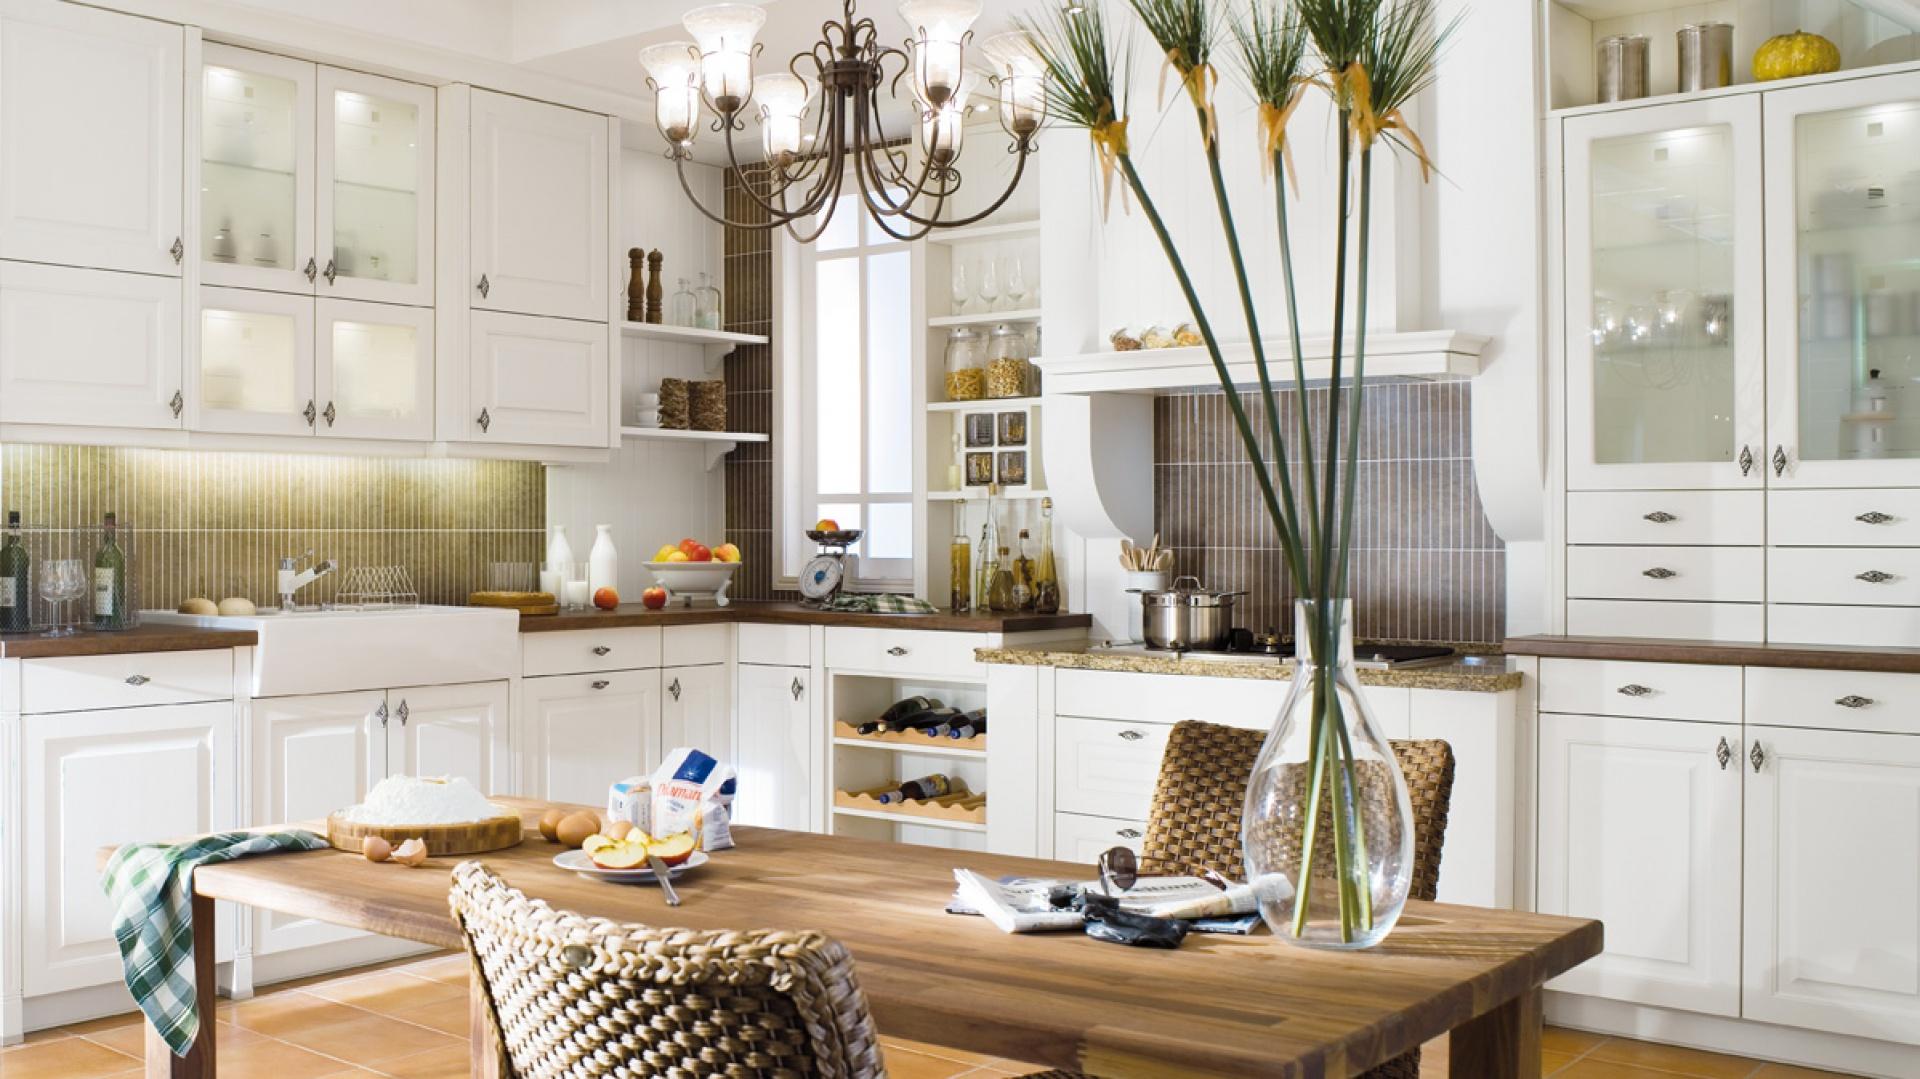 Kuchnia Stockholm to Biała klasyczna kuchnia 5   -> Kuchnie Z Uchwytami